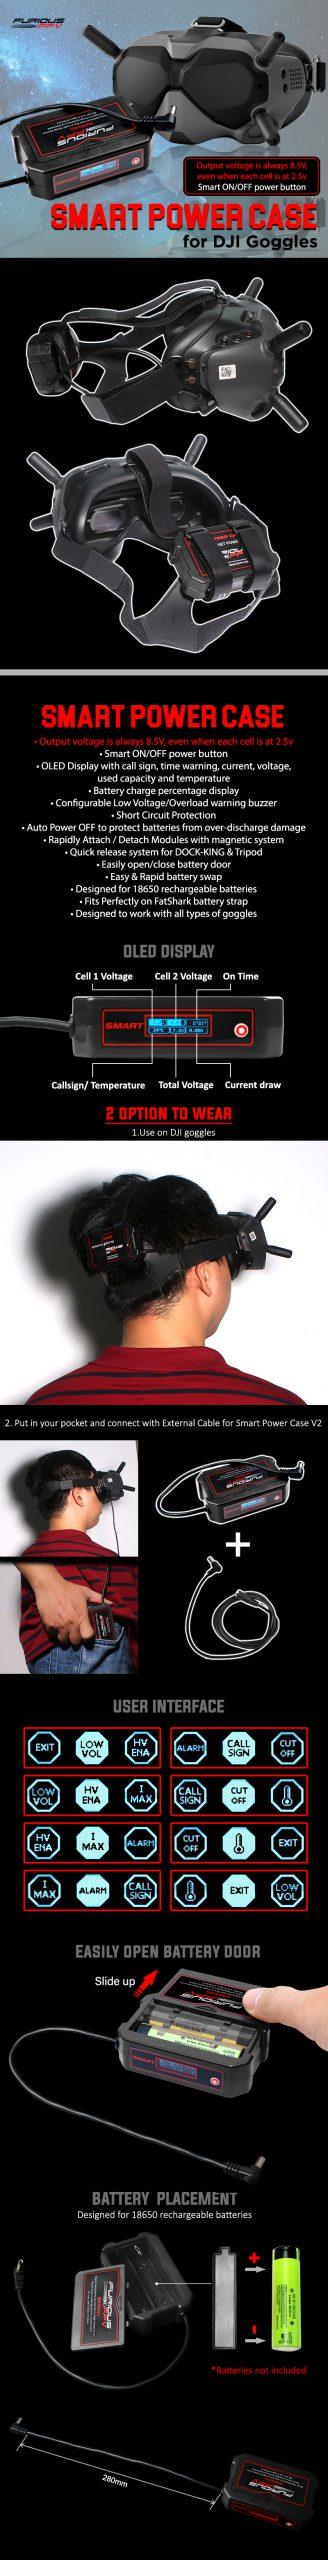 Comprar Estuche inteligente Gafas DJI FPV